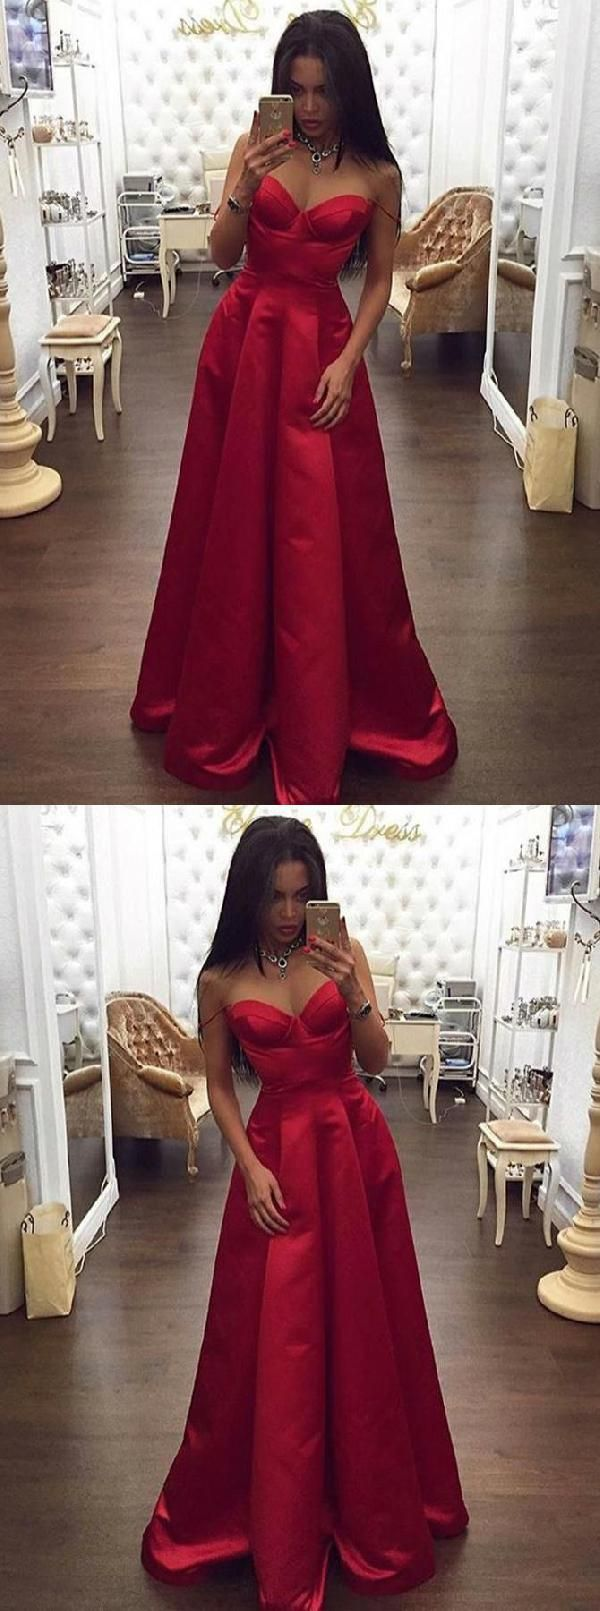 Trendy prom dresses backless prom dresses aline prom dresses